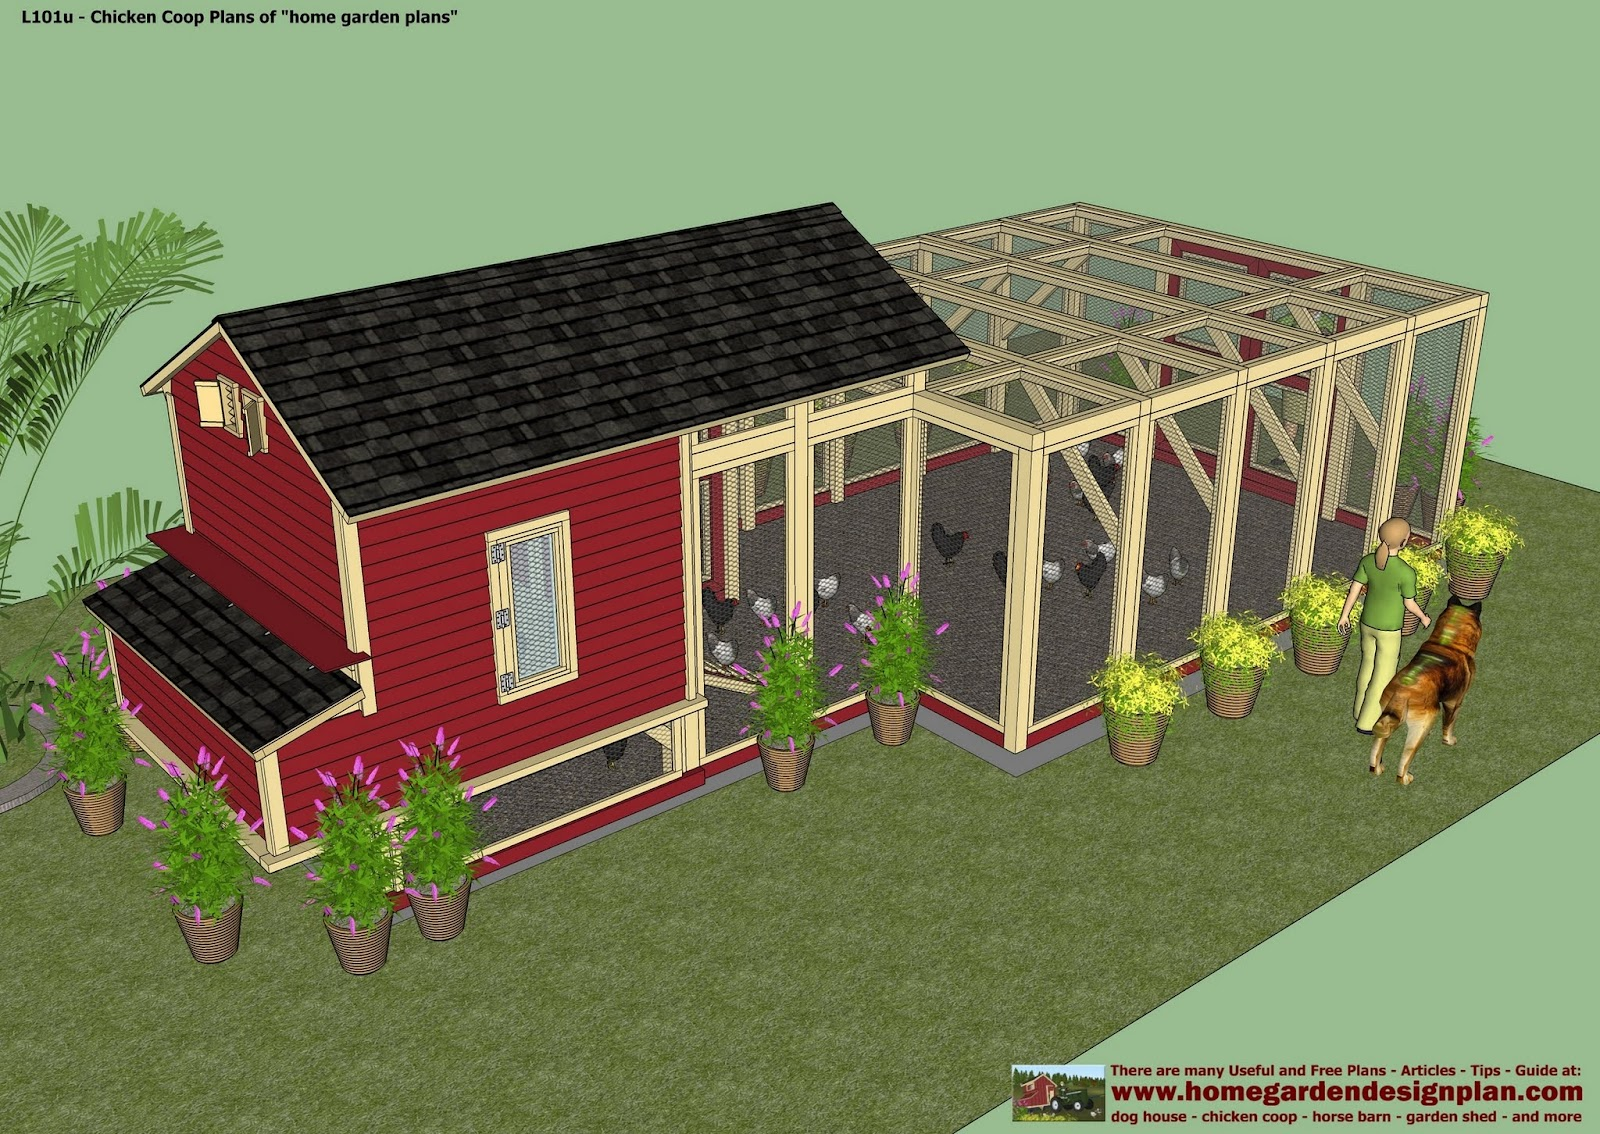 Greenhouse Blueprints Home Garden Plans L101 Chicken Coop Plans Construction